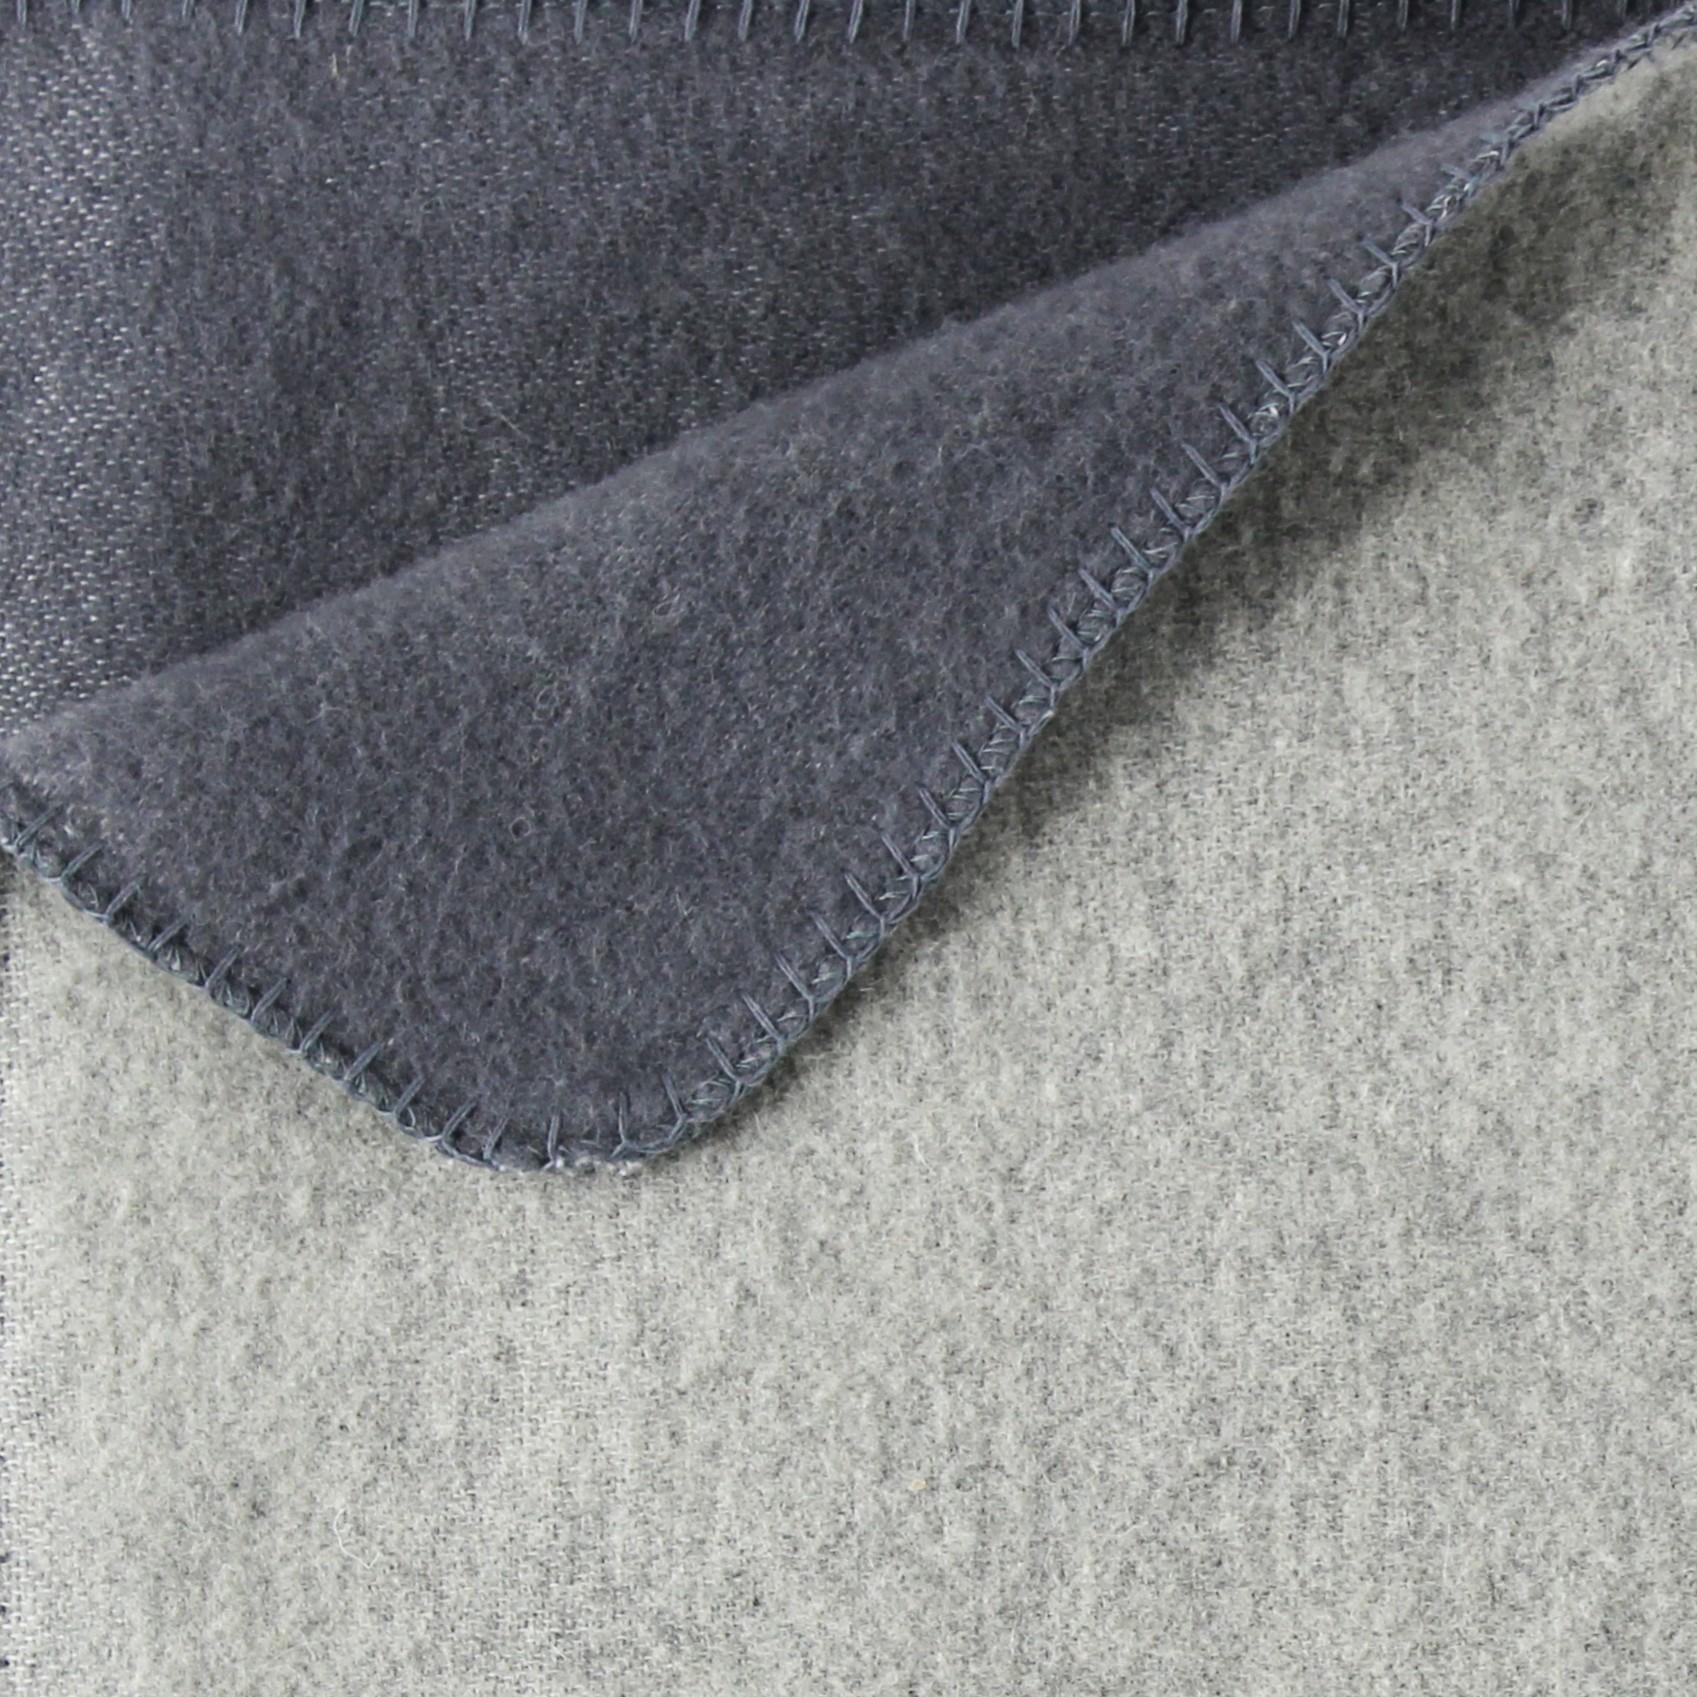 100_australain_merino_wool_blanket_rev_grey_charcoal.detail_1_.jpg